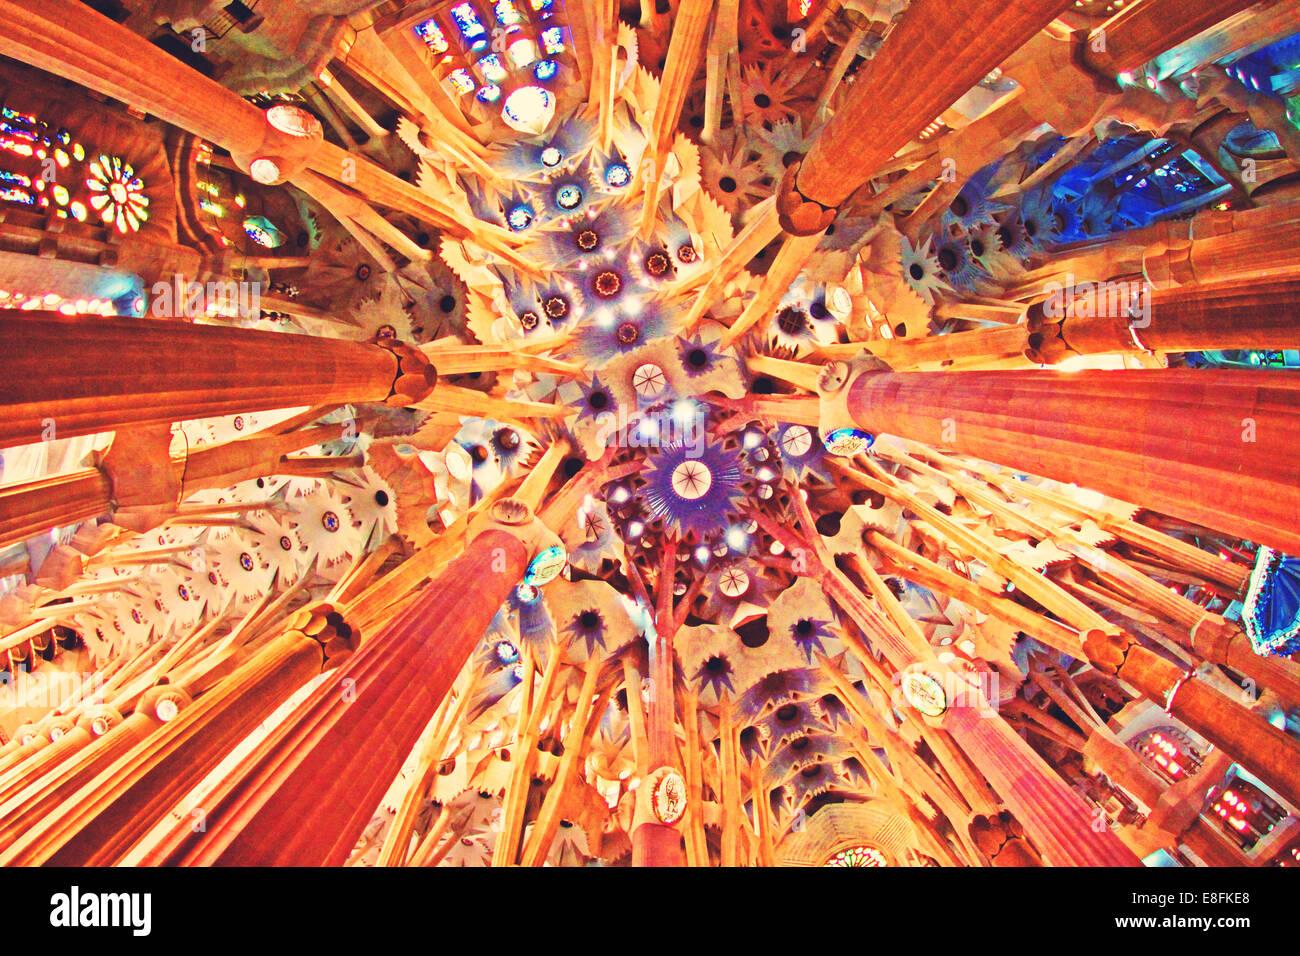 Spain, Barcelona, Sagrada Familia, Ceiling - Stock Image